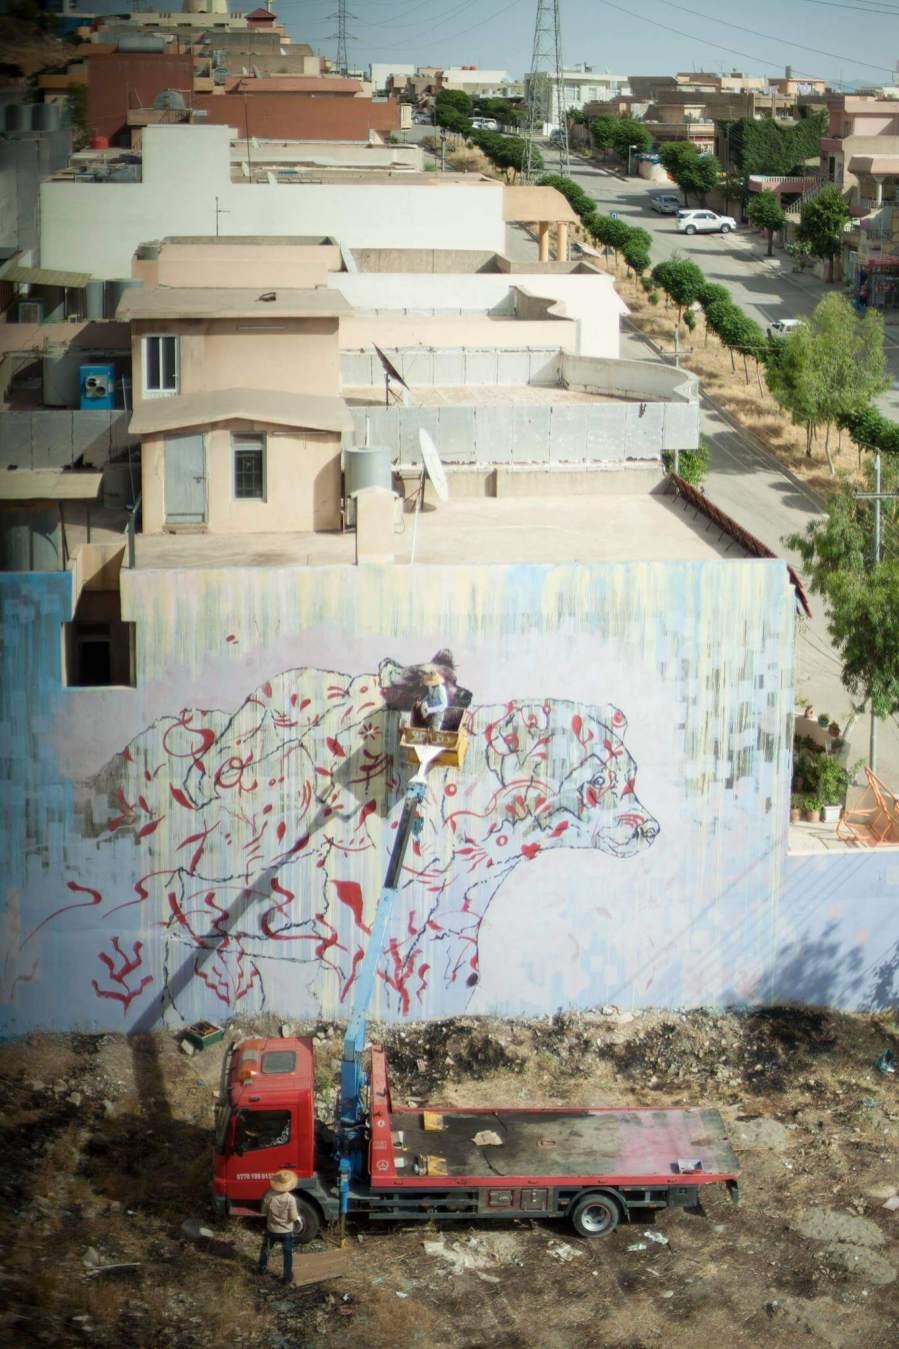 ernesto-maranje-iraq-refugee-street-art-mural-photo-credit-aptart-2